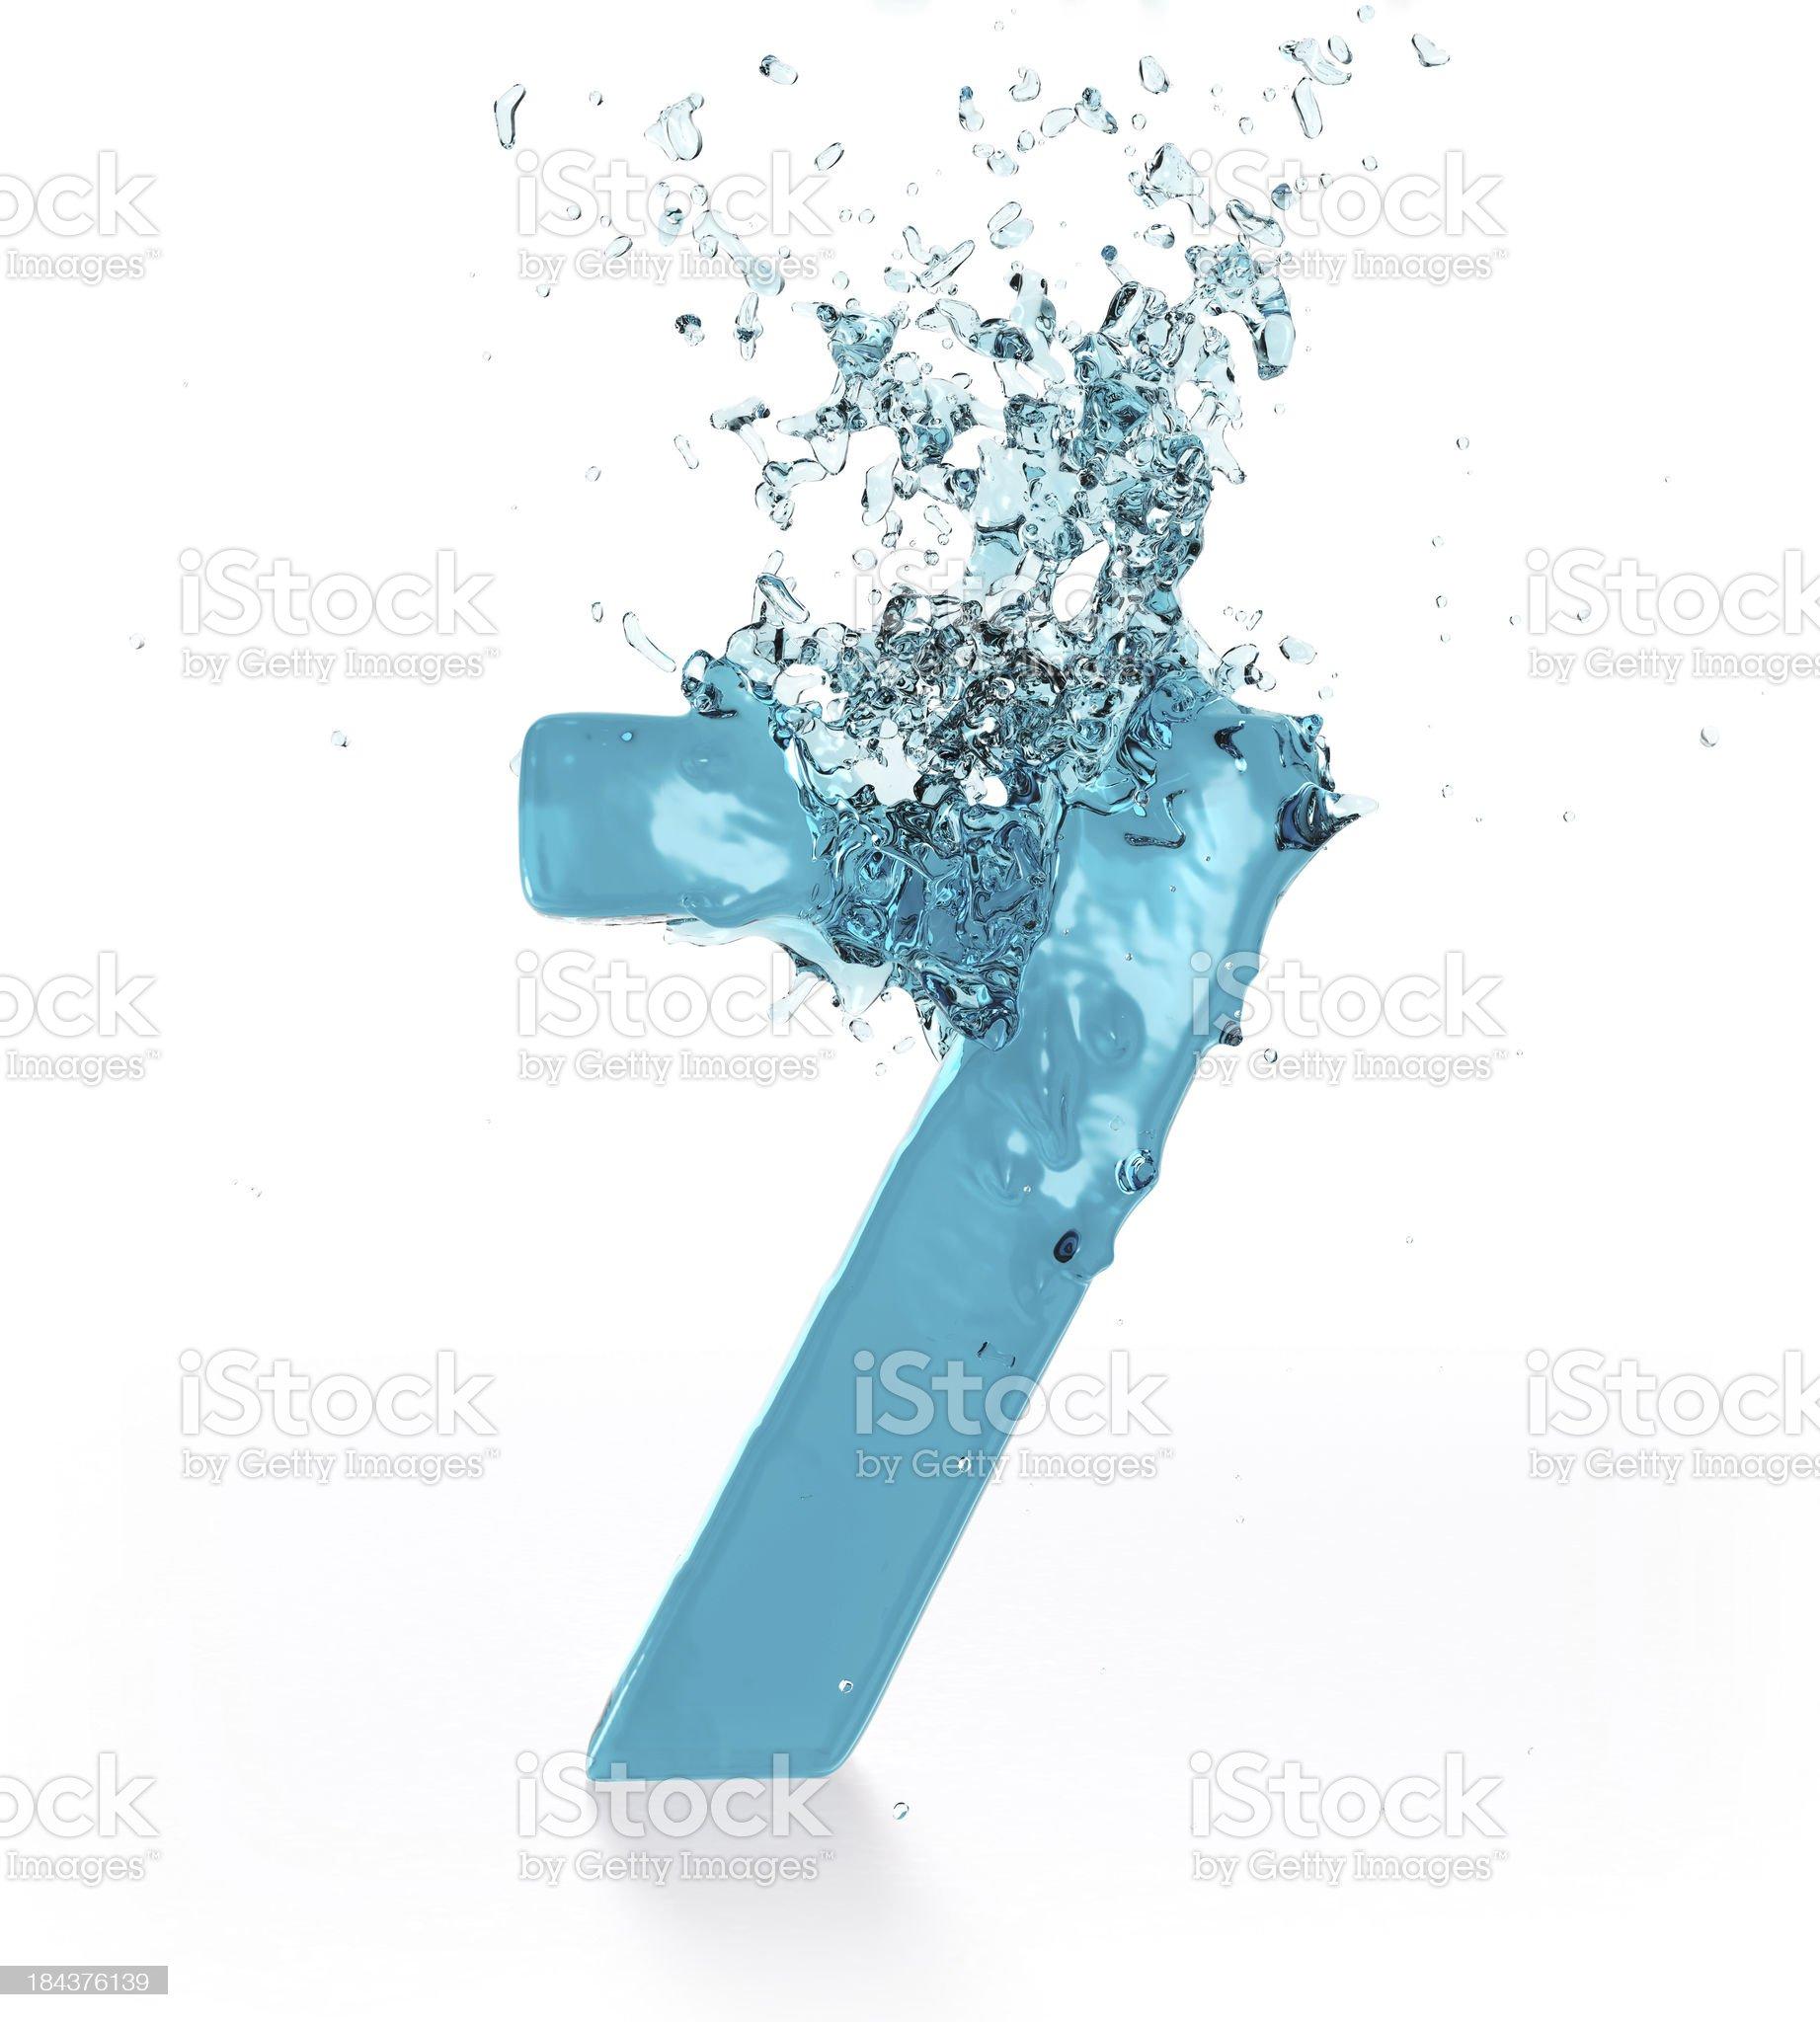 Liquid Number 7 royalty-free stock photo